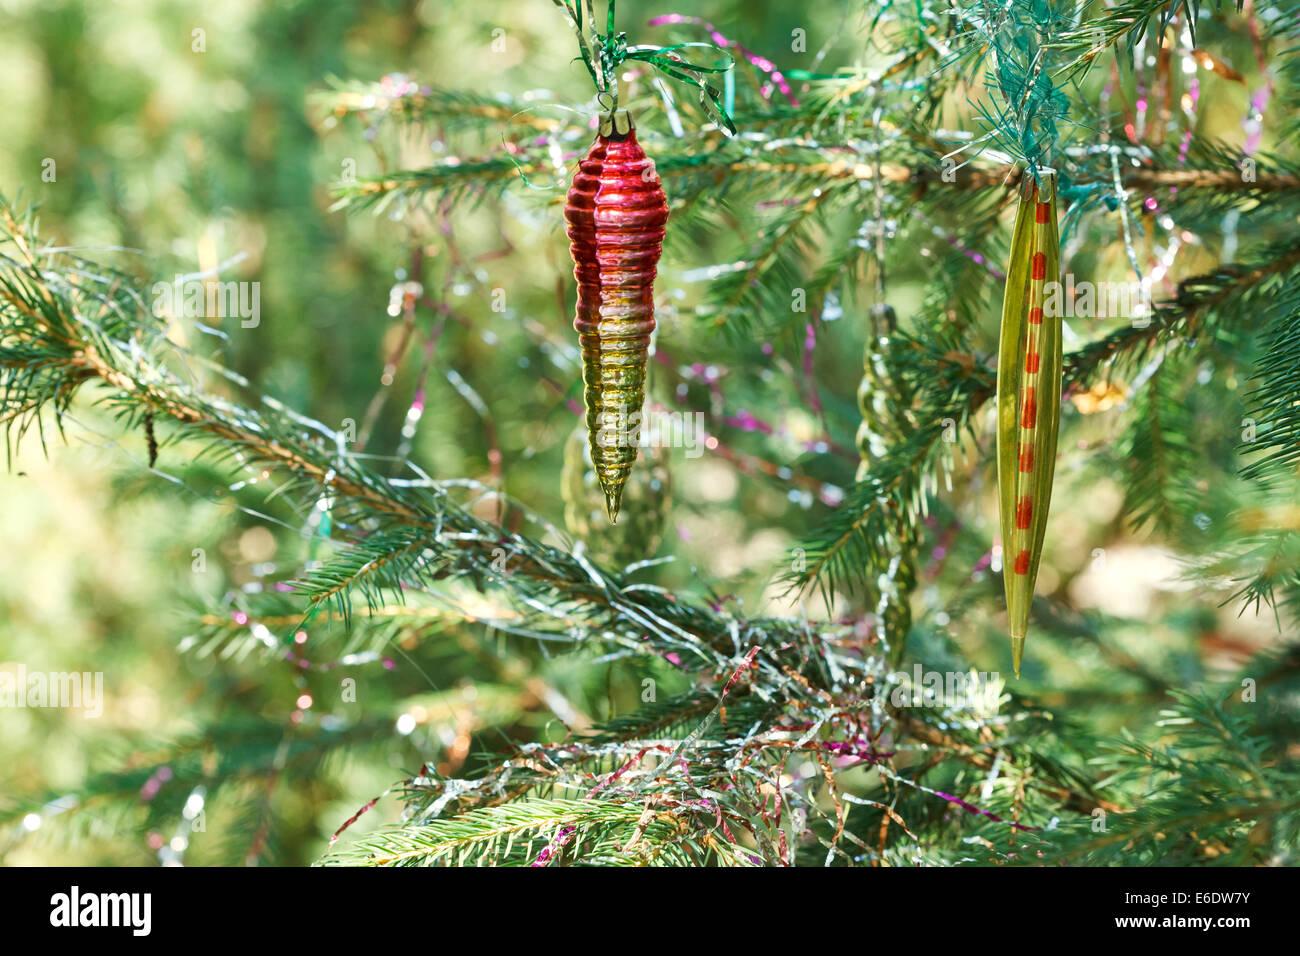 vintage glass icicles christmas tree decoration close up stock image - Icicles For Christmas Tree